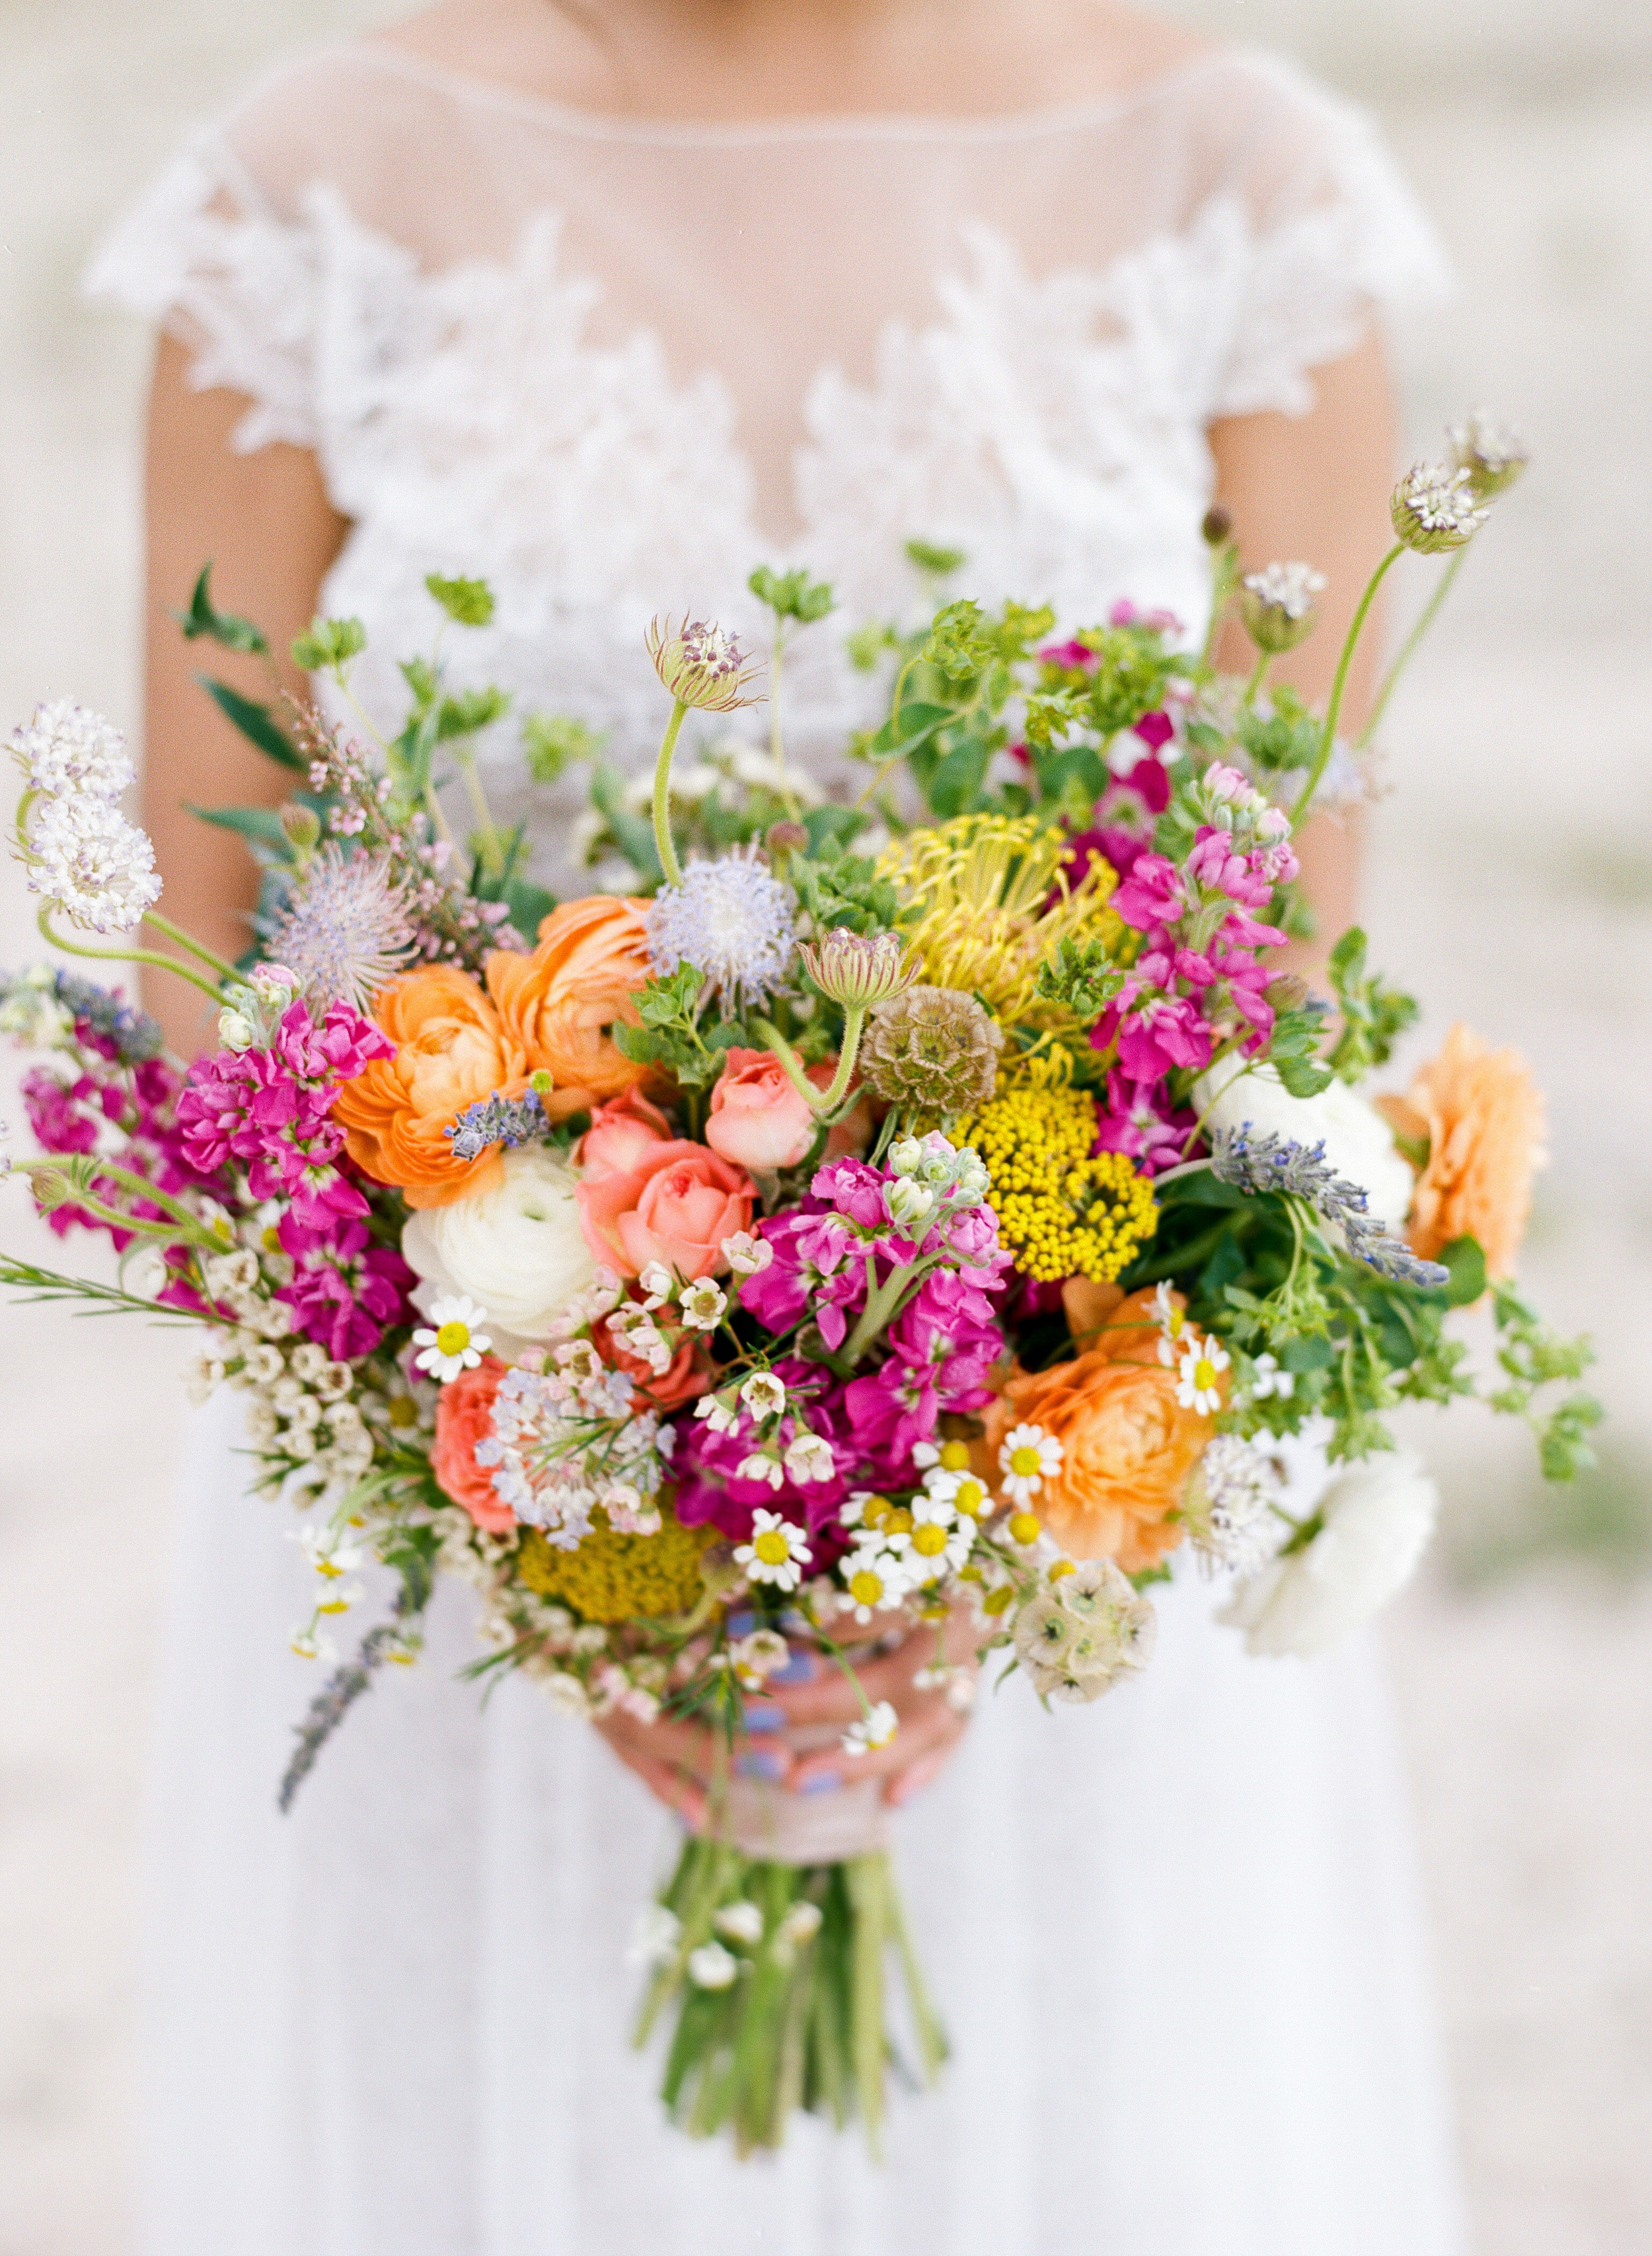 Dana-Fernandez-Photography-Martha-Stewart-Weddings-Houston-Texas-Wedding-Photographer-Film-7.jpg